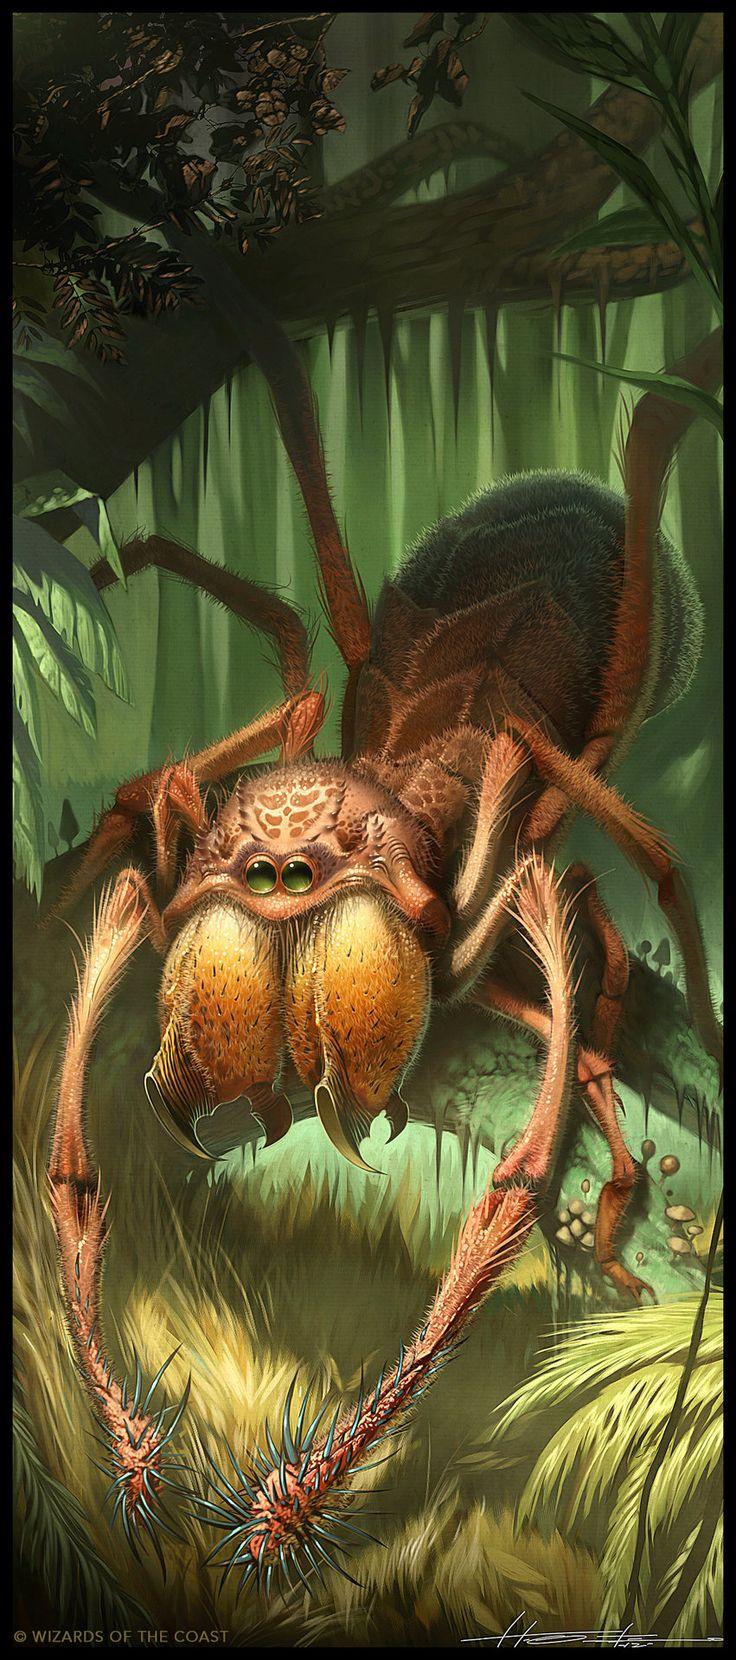 High dawnknight tlinthar regheriad lathander paladin iluskan order - Artstation Spider Hector Ortiz